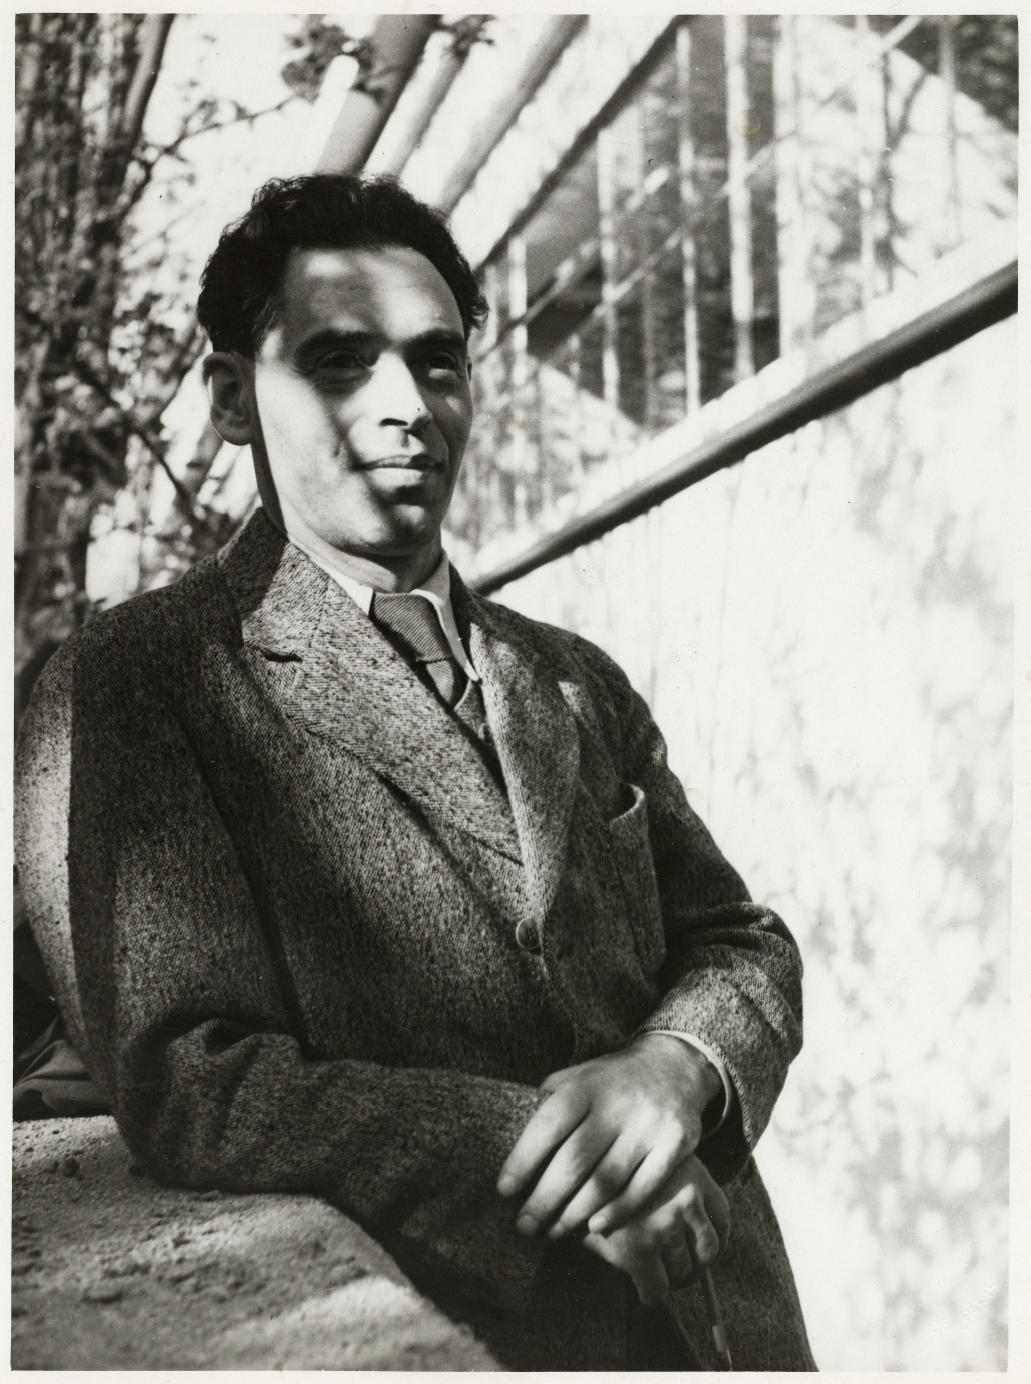 Борис Михайлович Иофан, архитектор Советского павильона